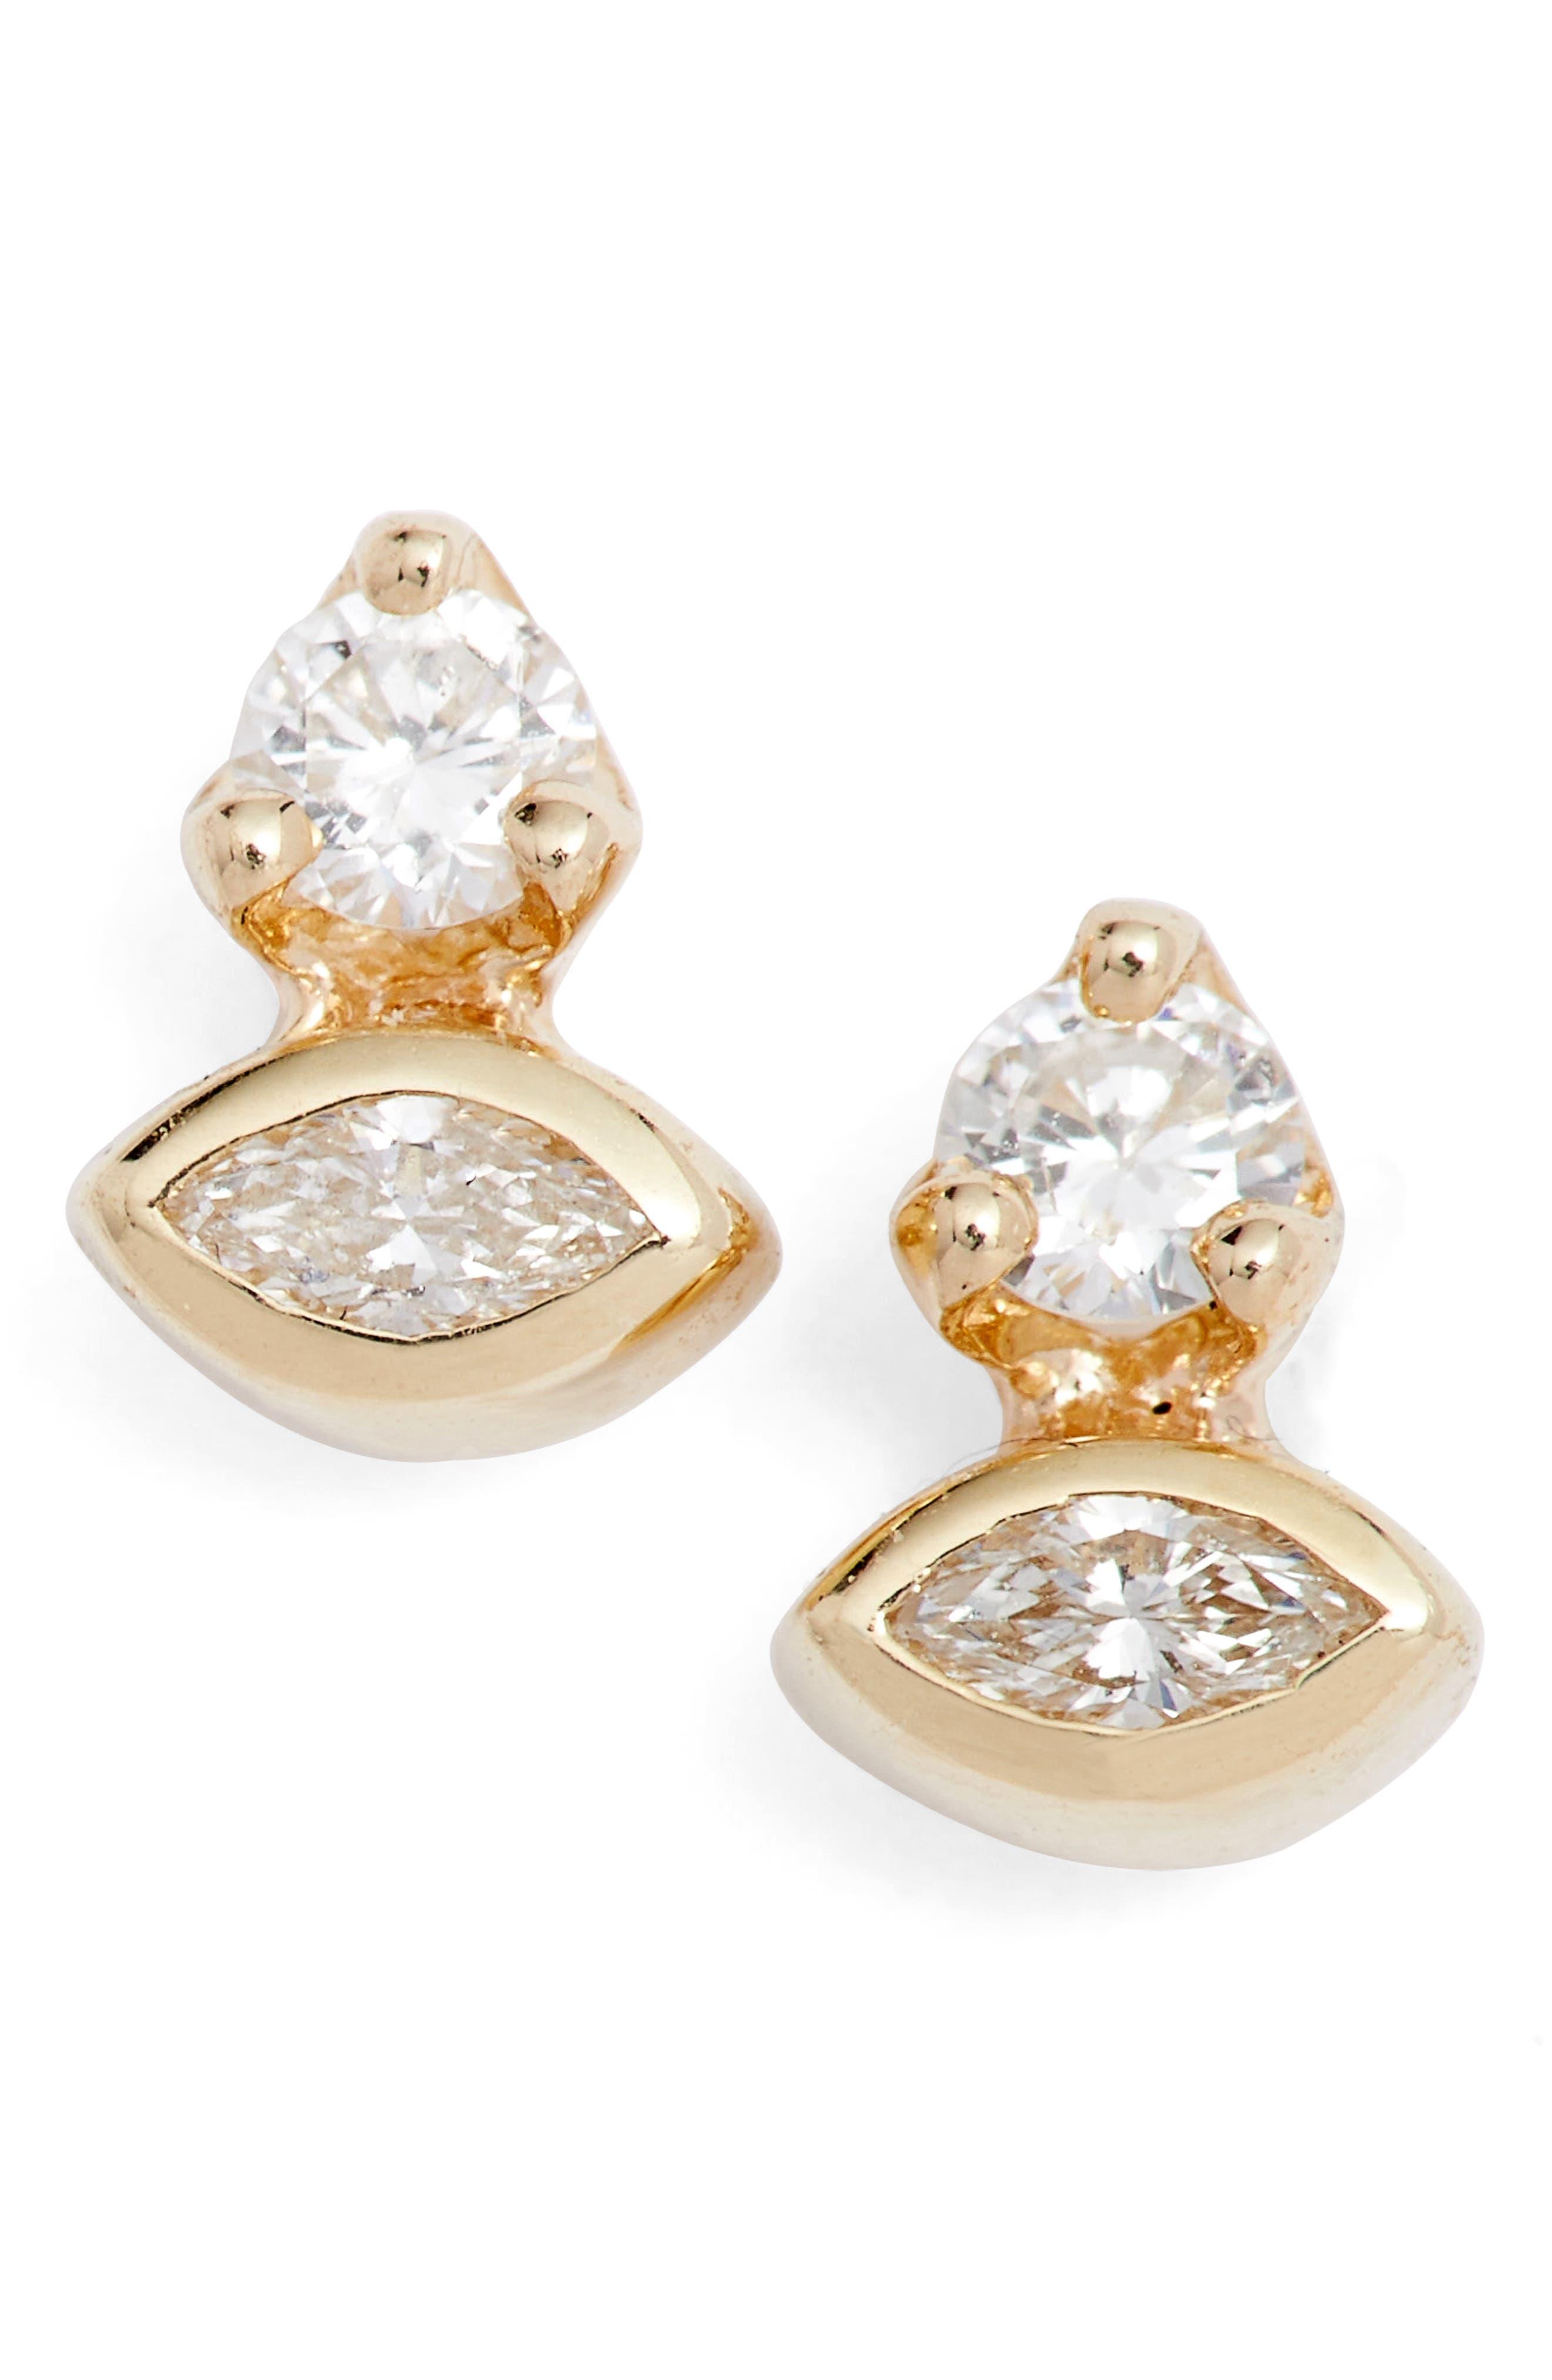 Diamond Cluster Stud Earrings,                             Main thumbnail 1, color,                             YELLOW GOLD